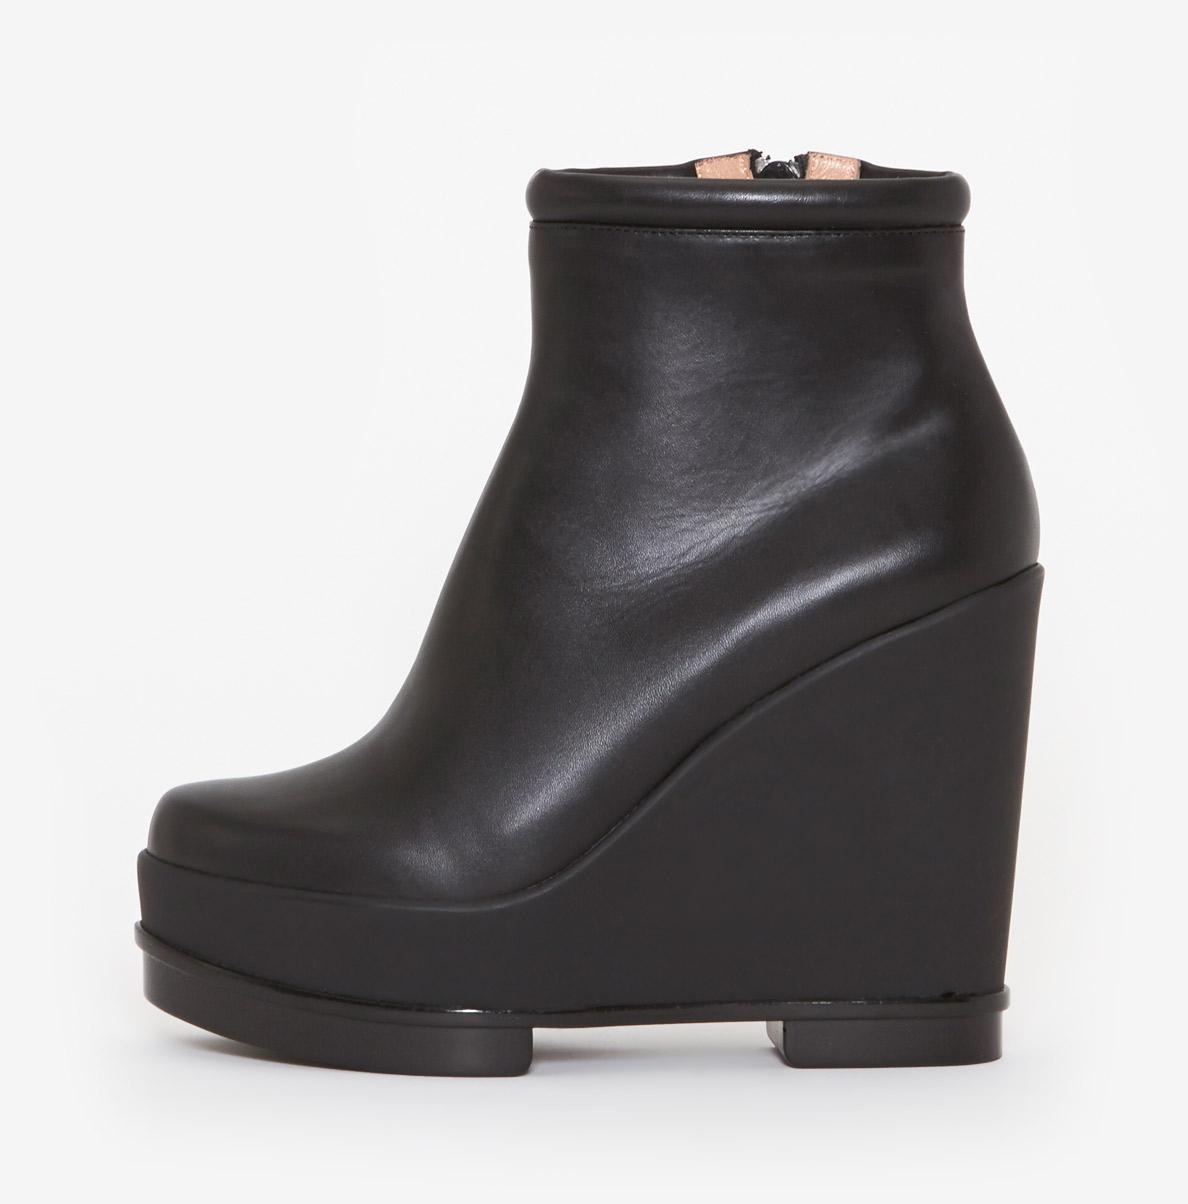 robert clergerie sarlah wedge boot in black lyst